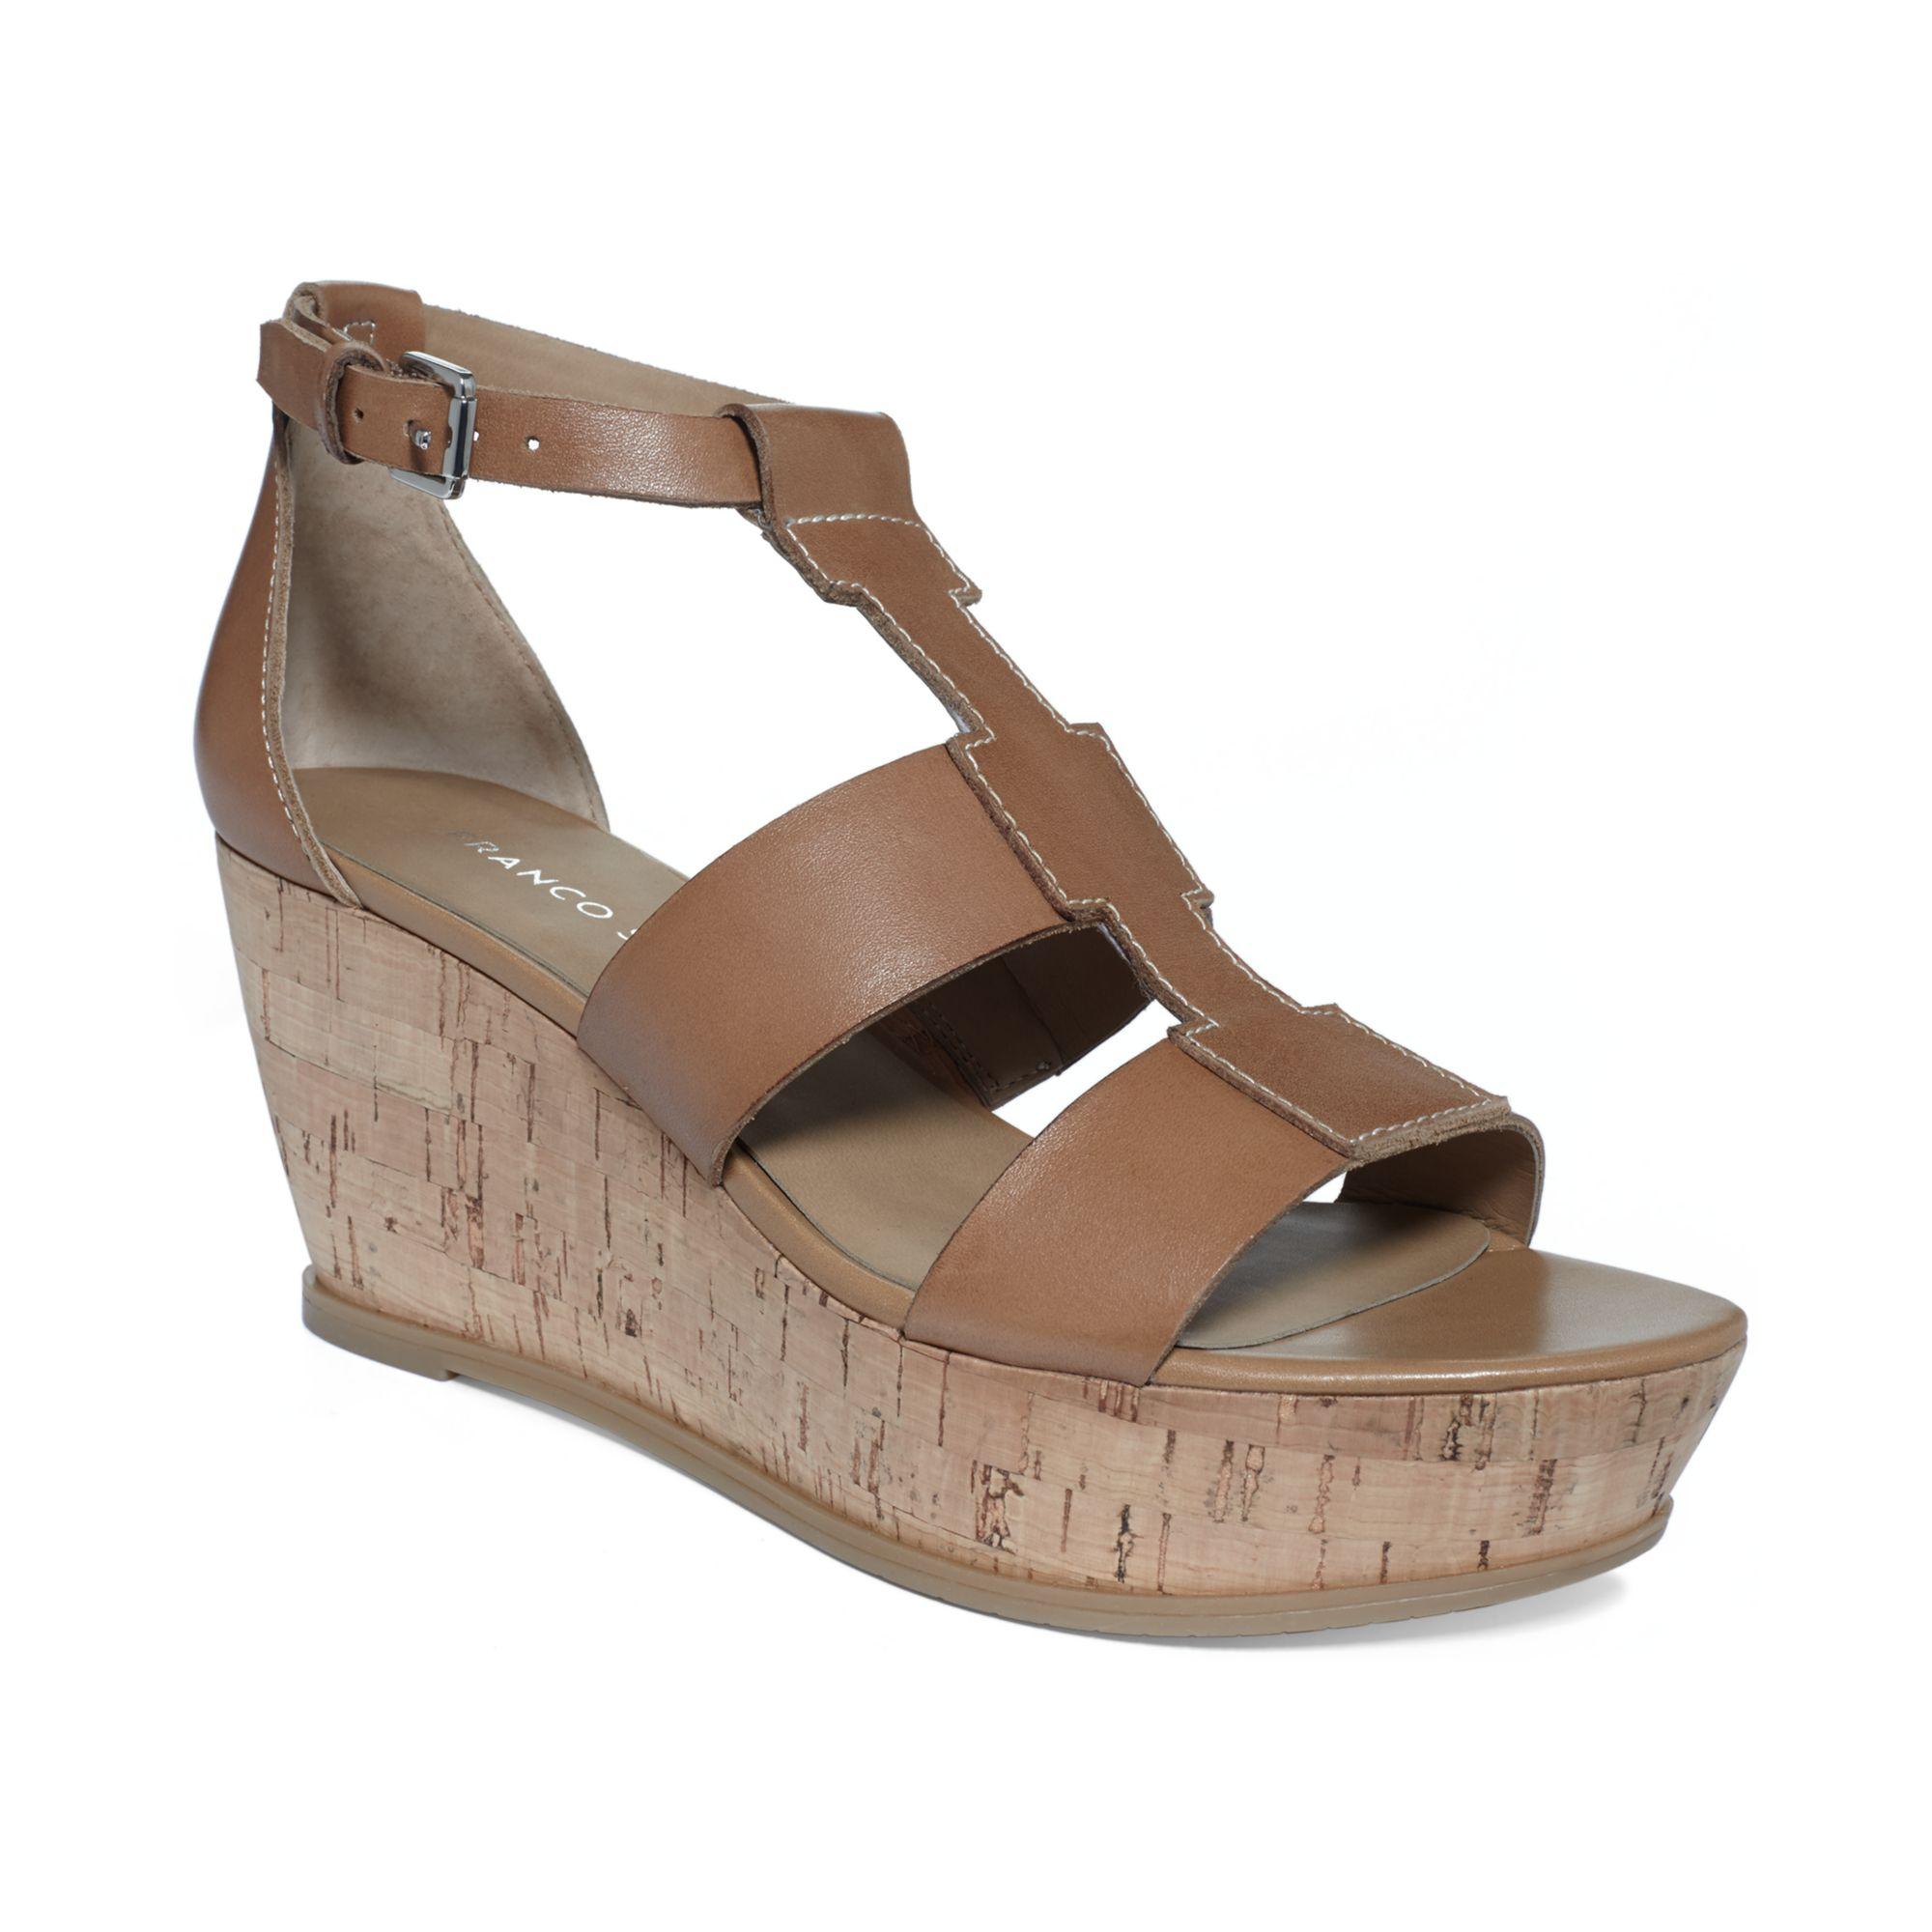 franco sarto falco cork wedge sandals in brown camelot